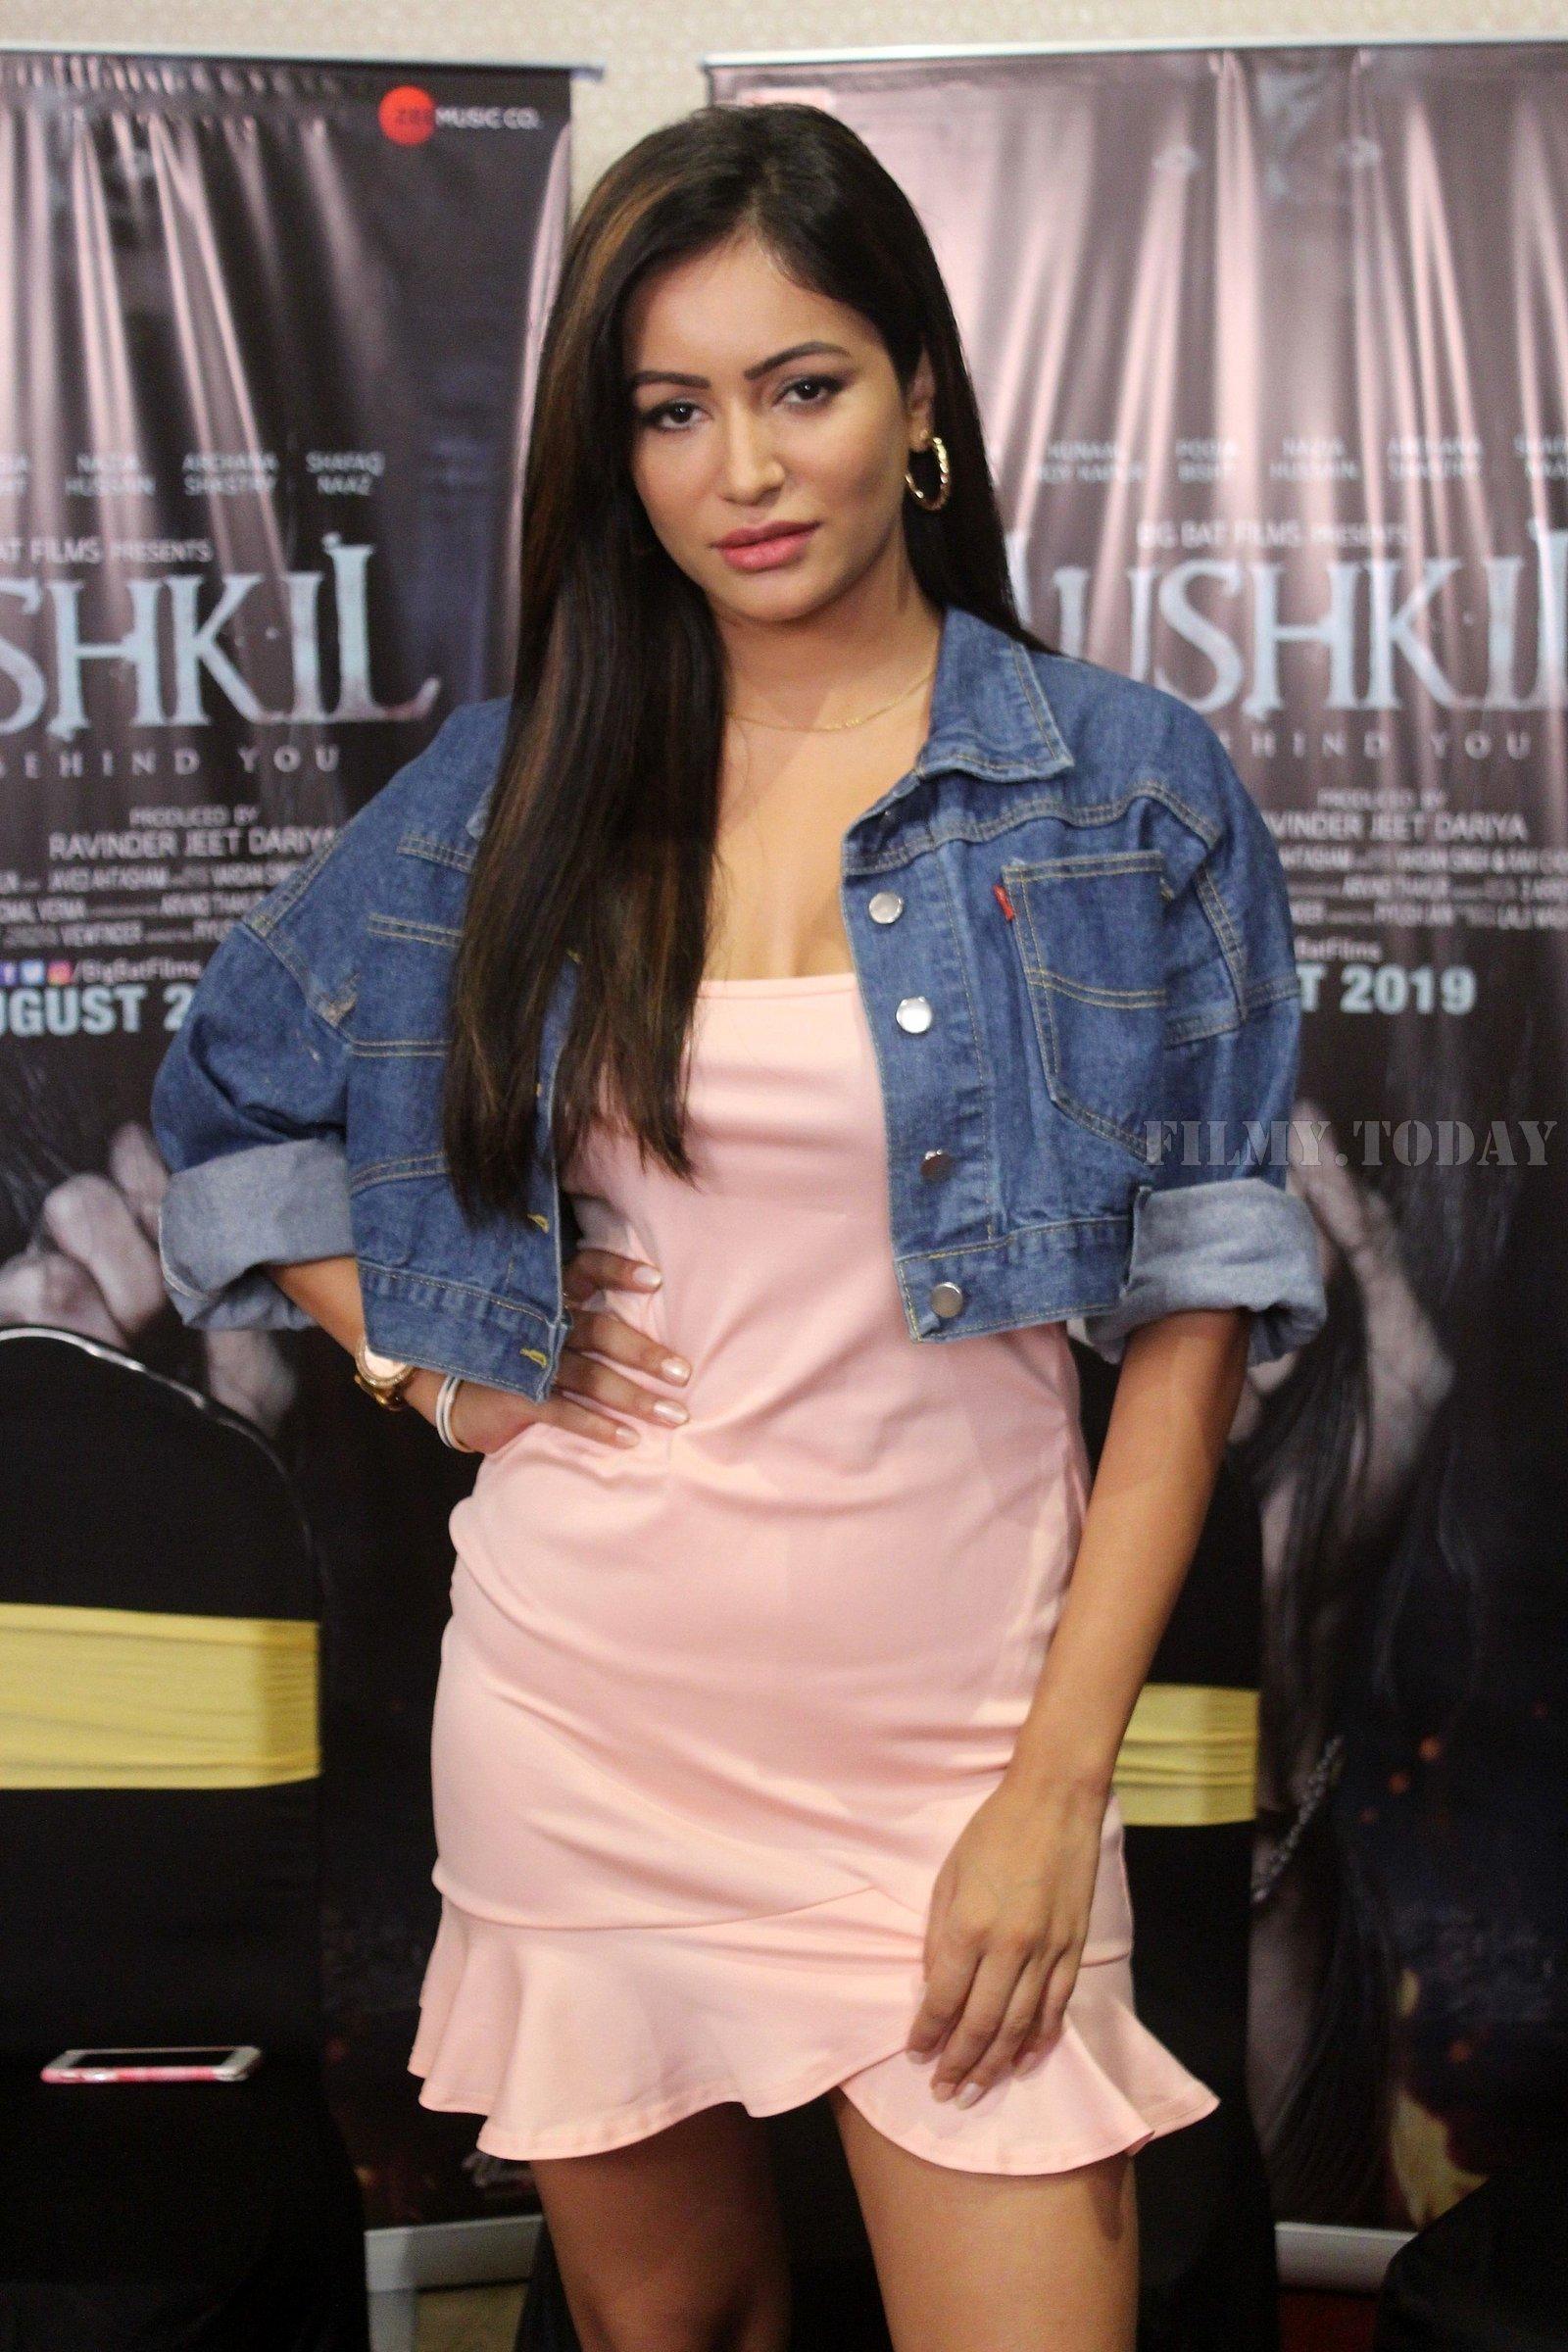 Pooja Bisht Biography, Age, Life Story Serials, Images - World Super Star Bio